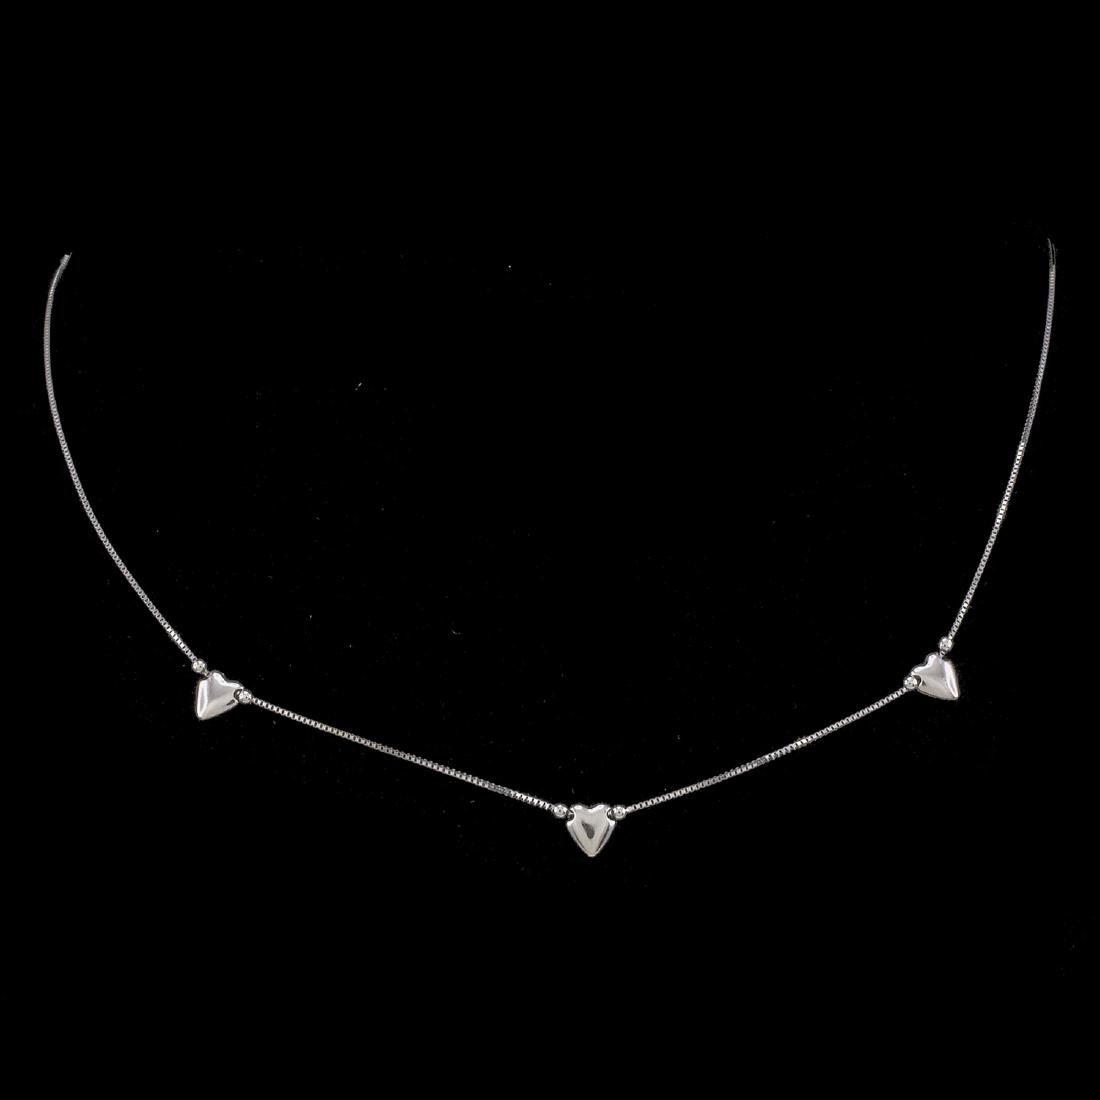 *Fine Jewelry 14 KT White Gold Box Chain W 3 Station